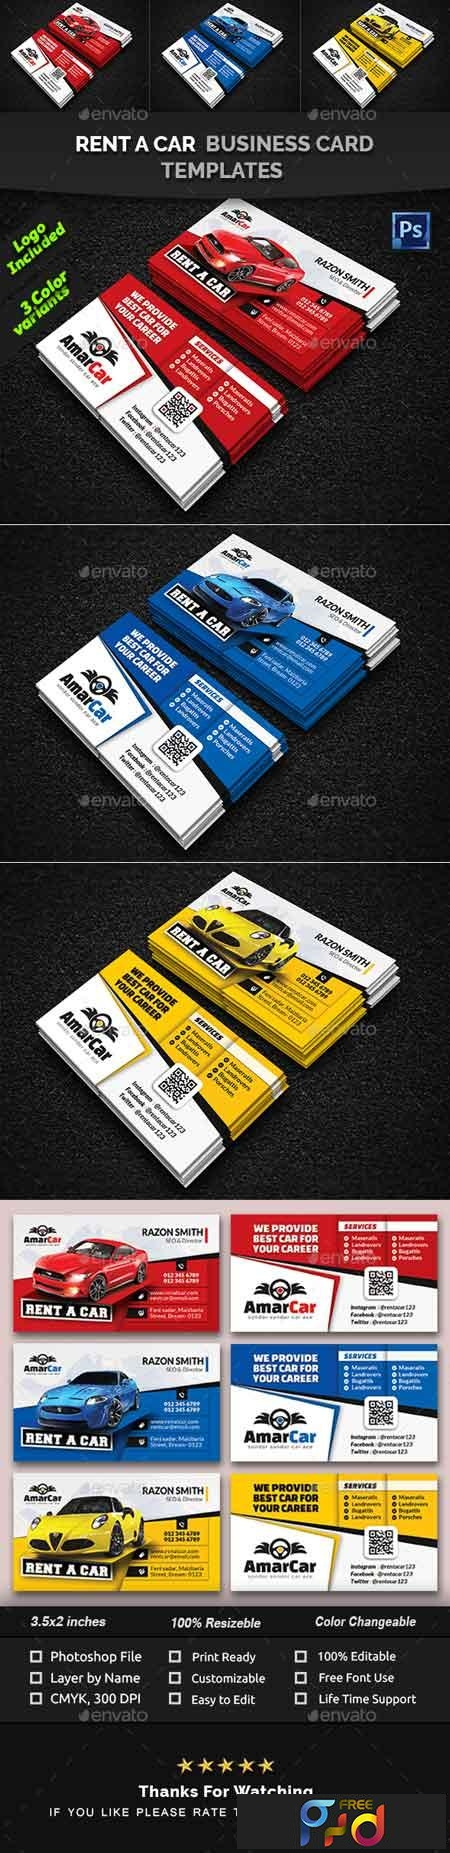 Rent a Car Business Card Templates 22558238 1